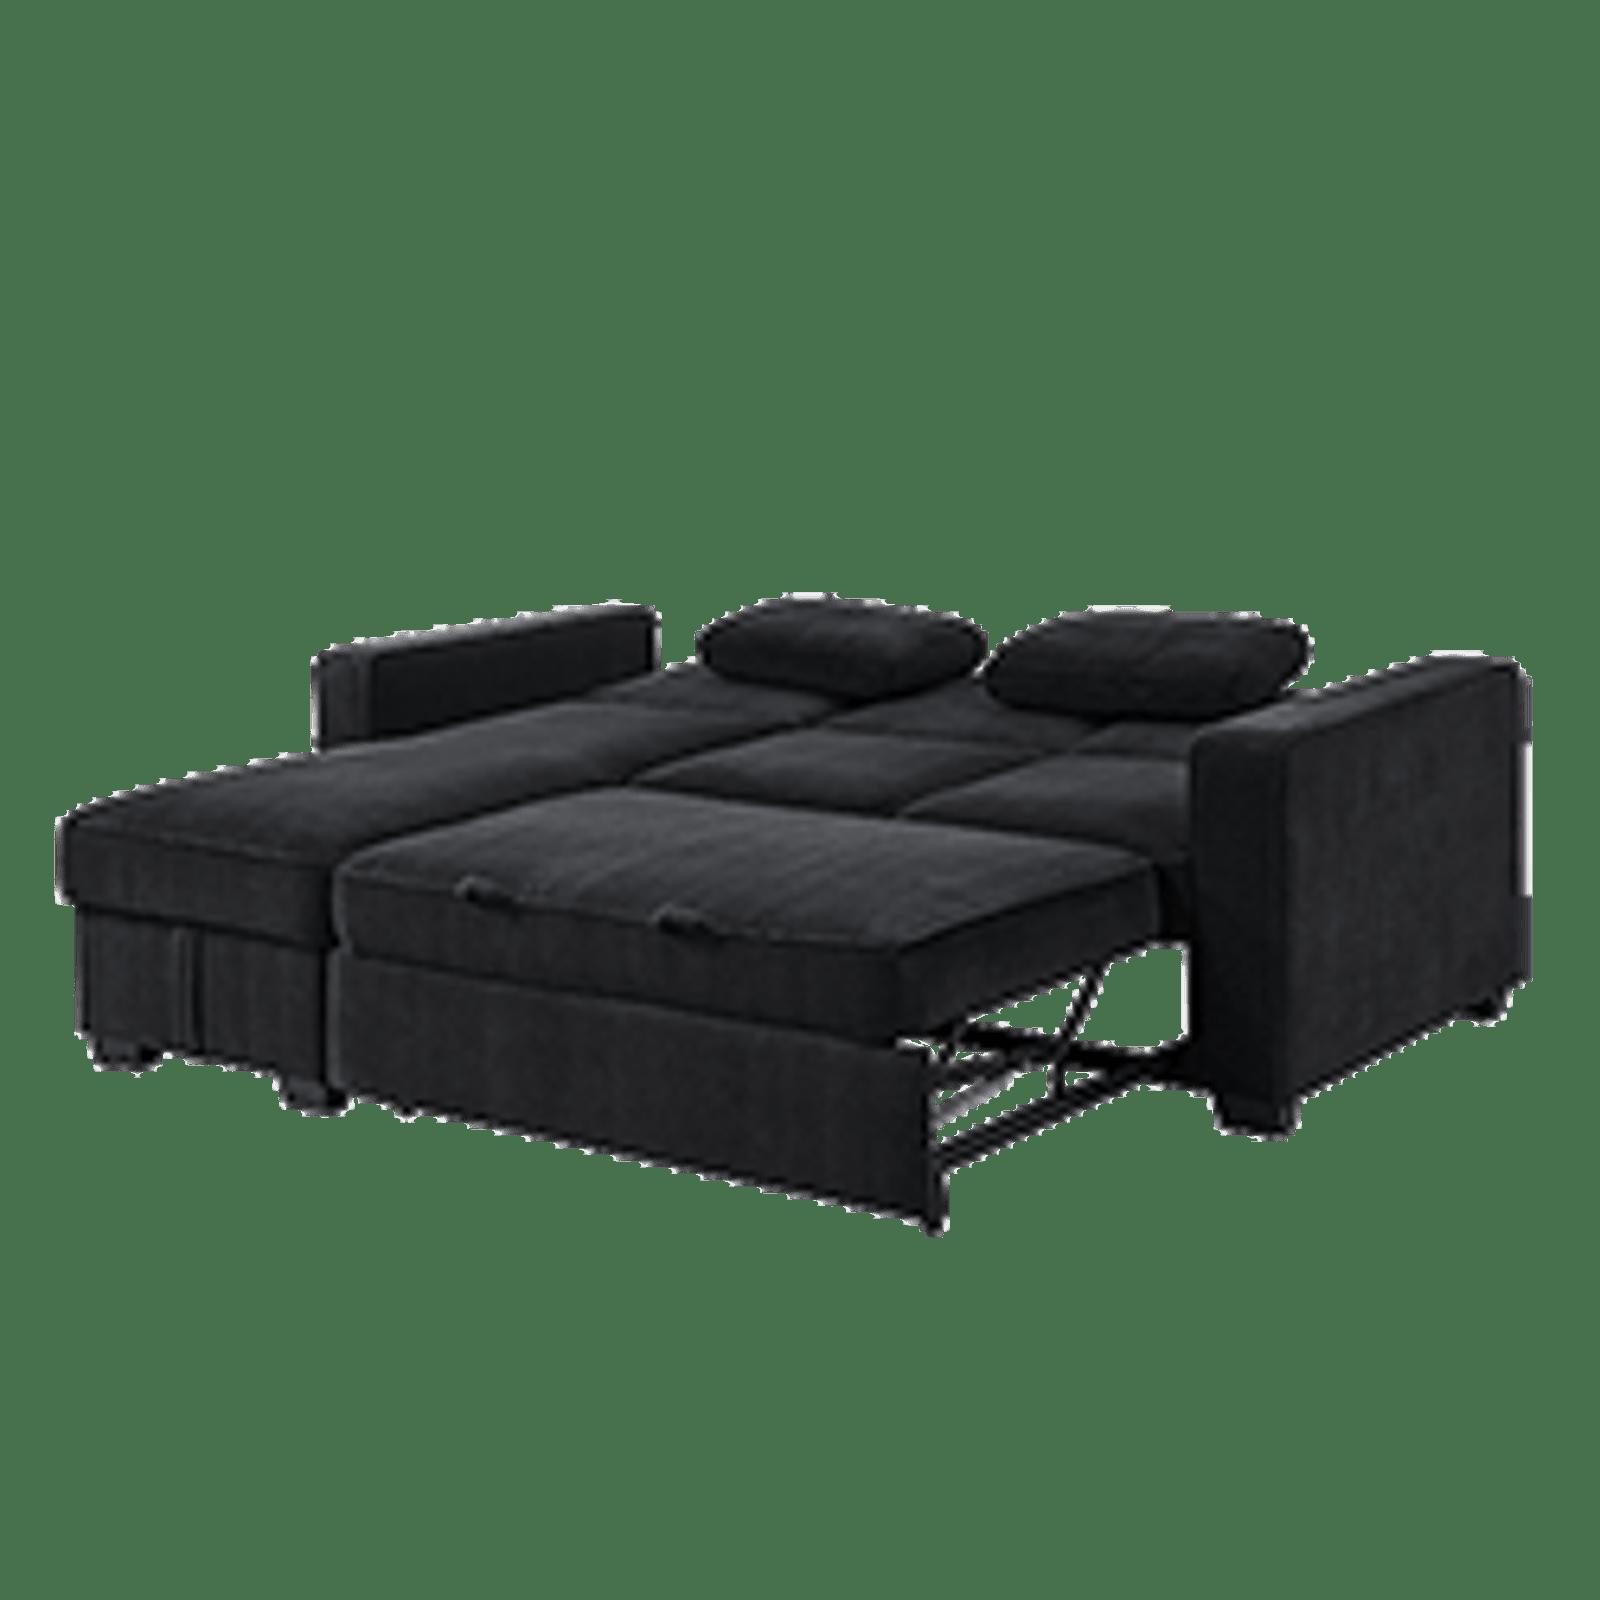 Sleeper Furniture Best Buy Canada